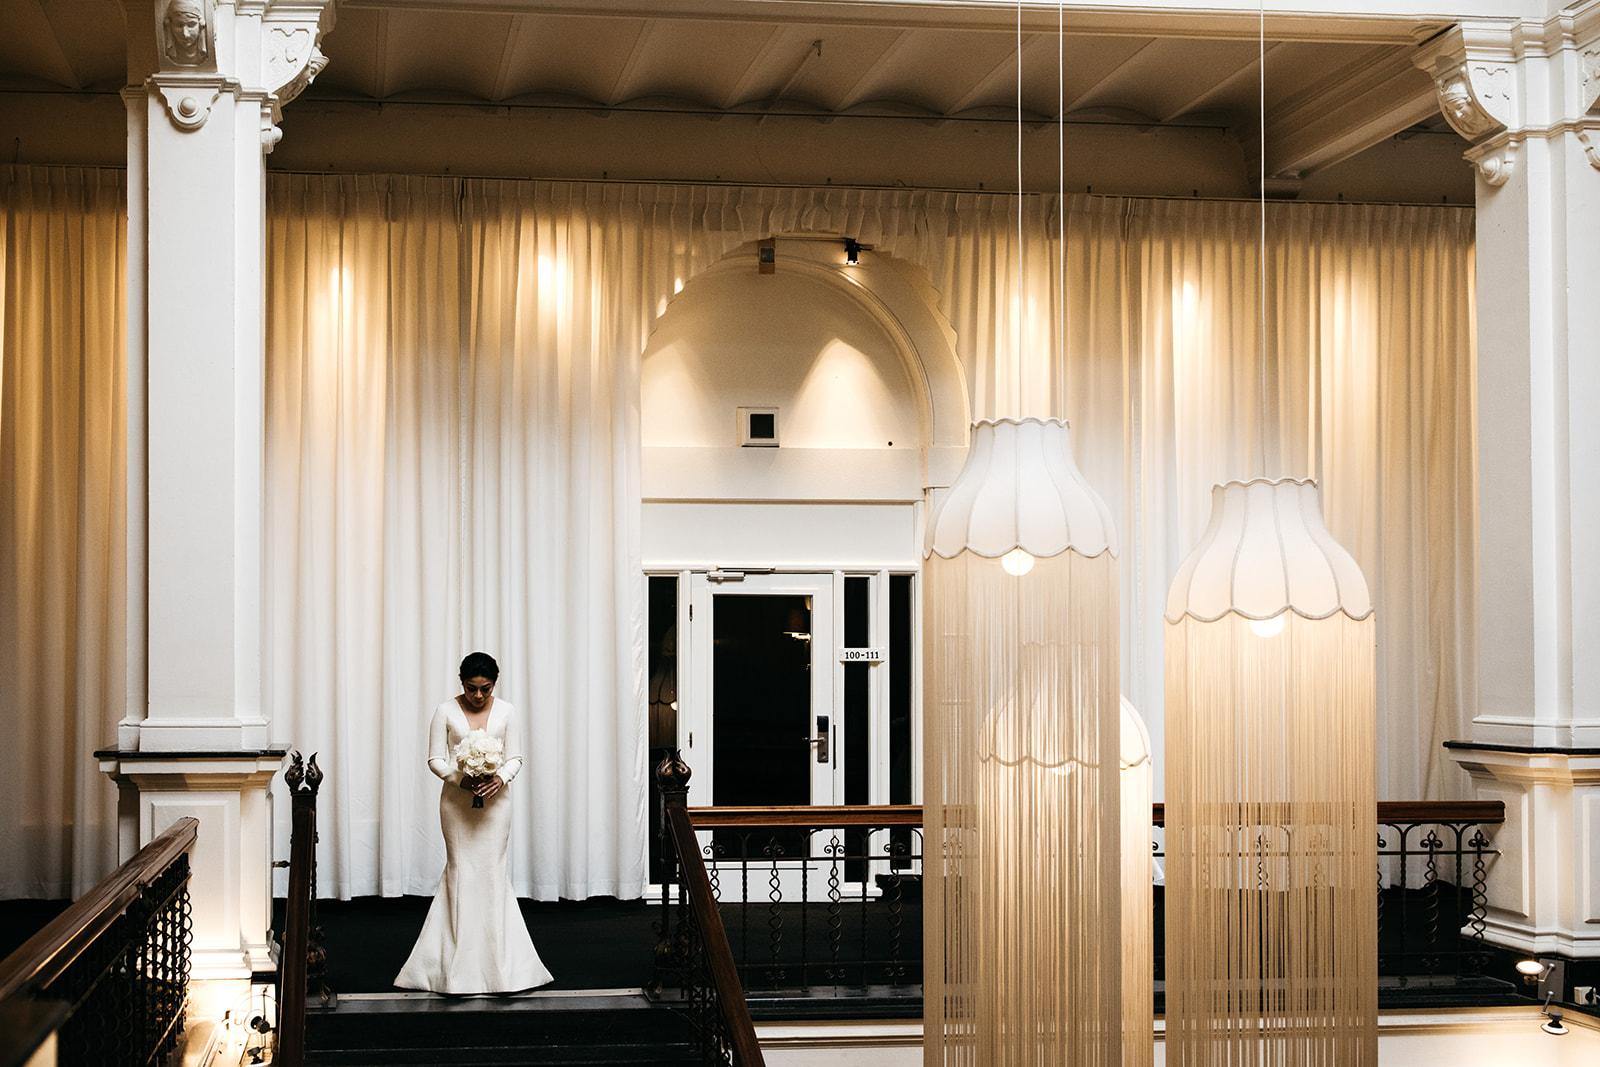 WiandaBongenPhotography-Cassandra_Ben-Wedding-57.jpg